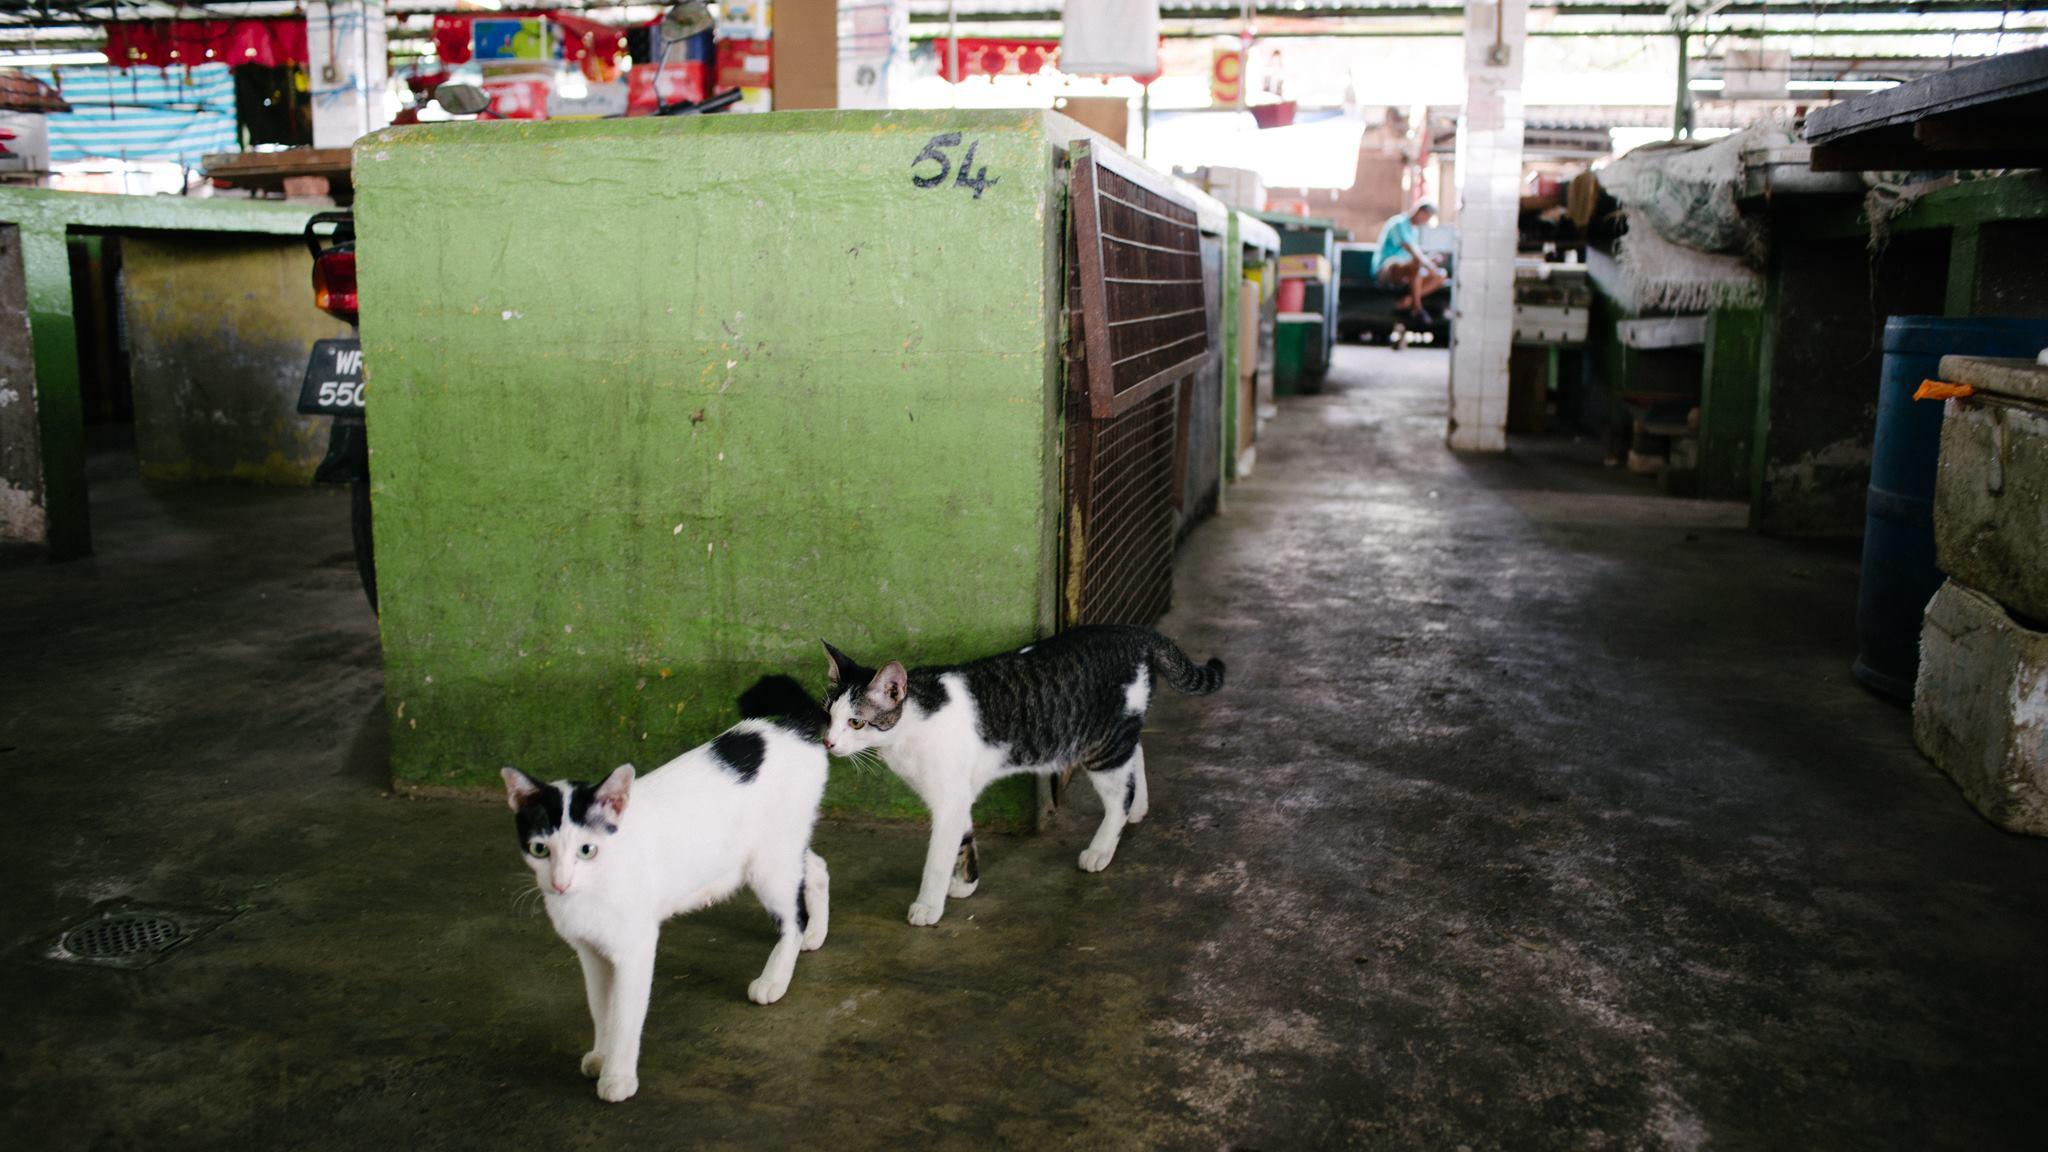 Image from SPCA Selangor